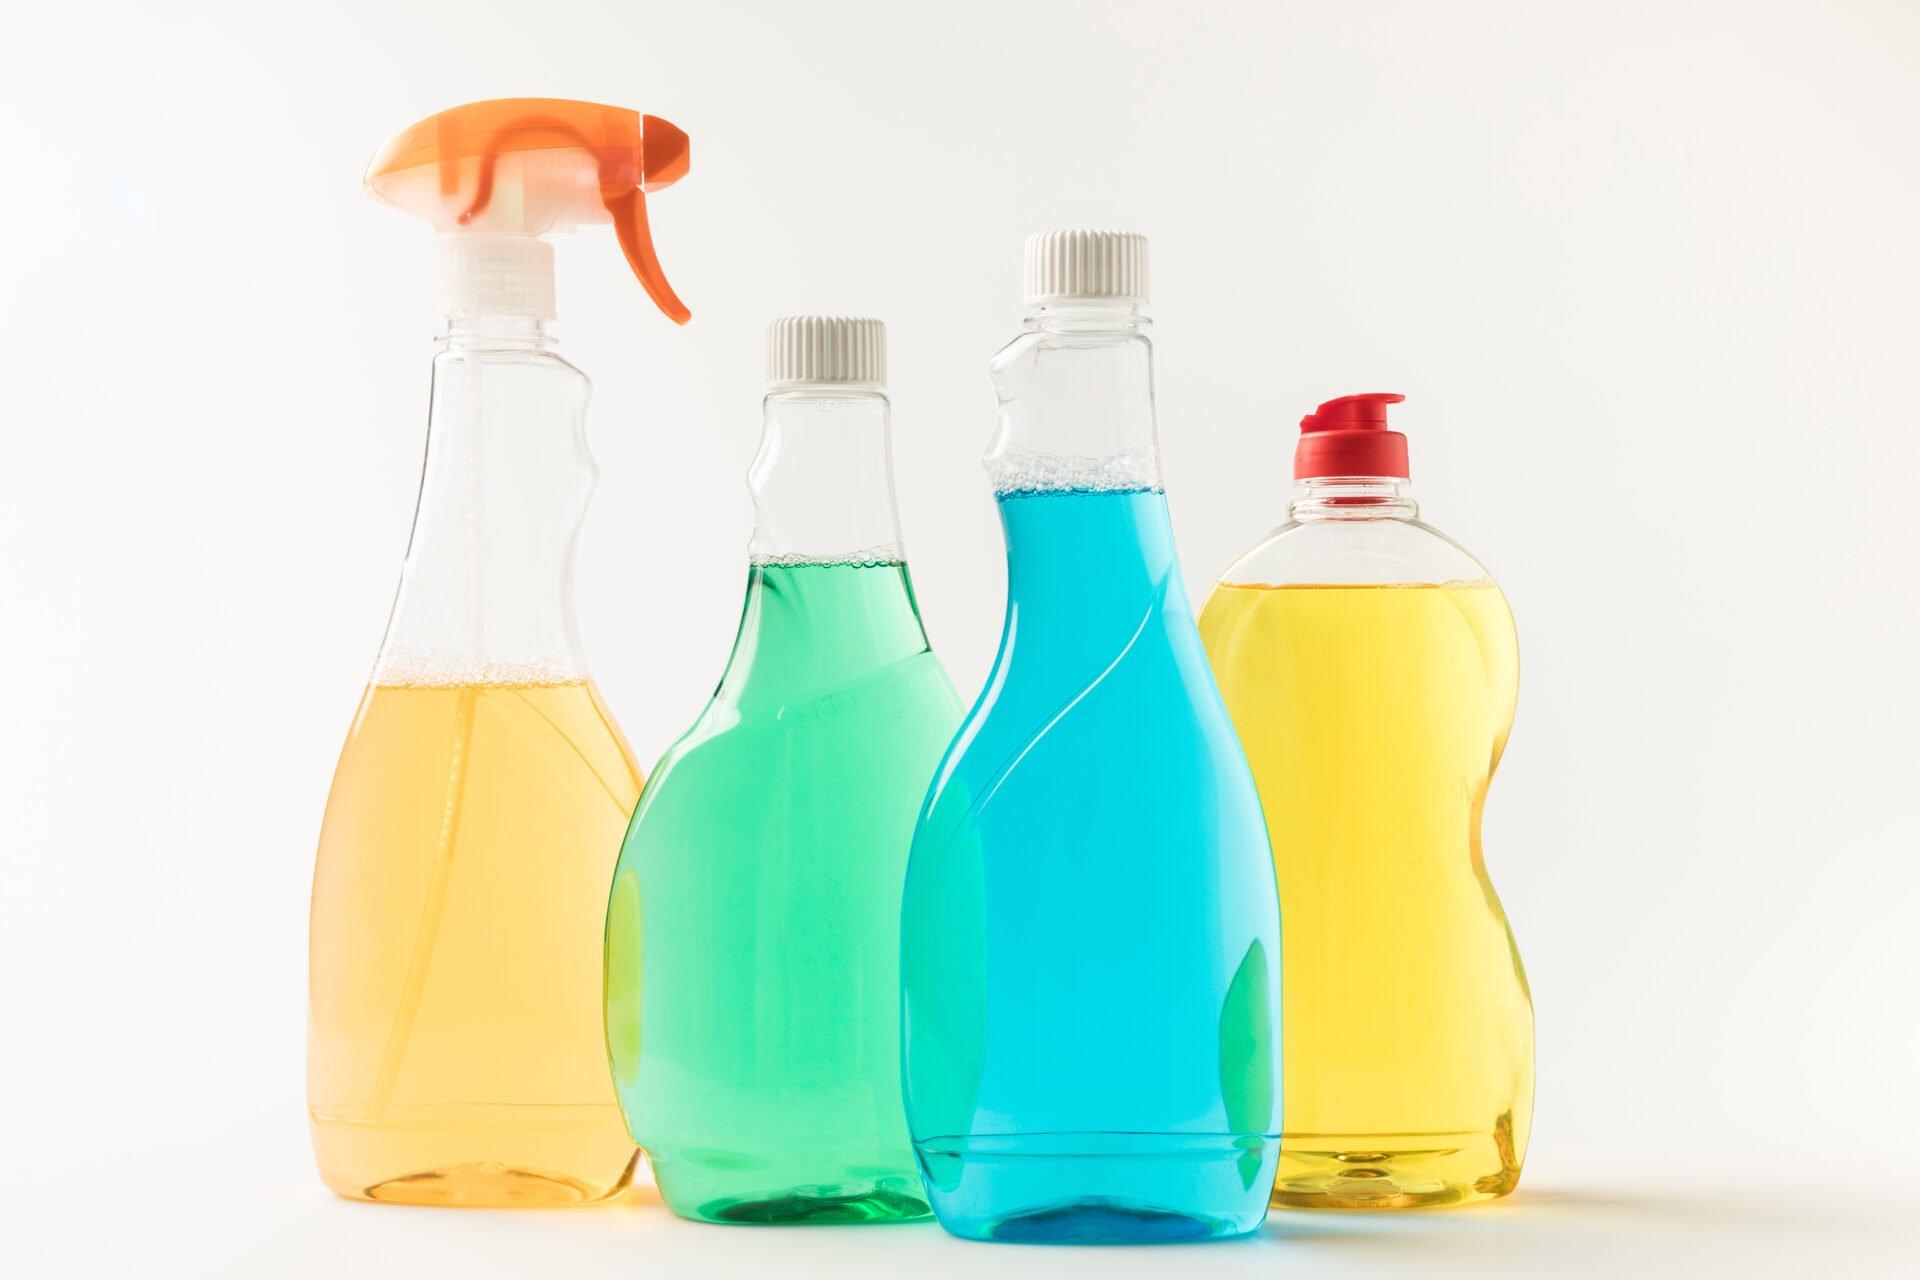 Quats used in disinfectants